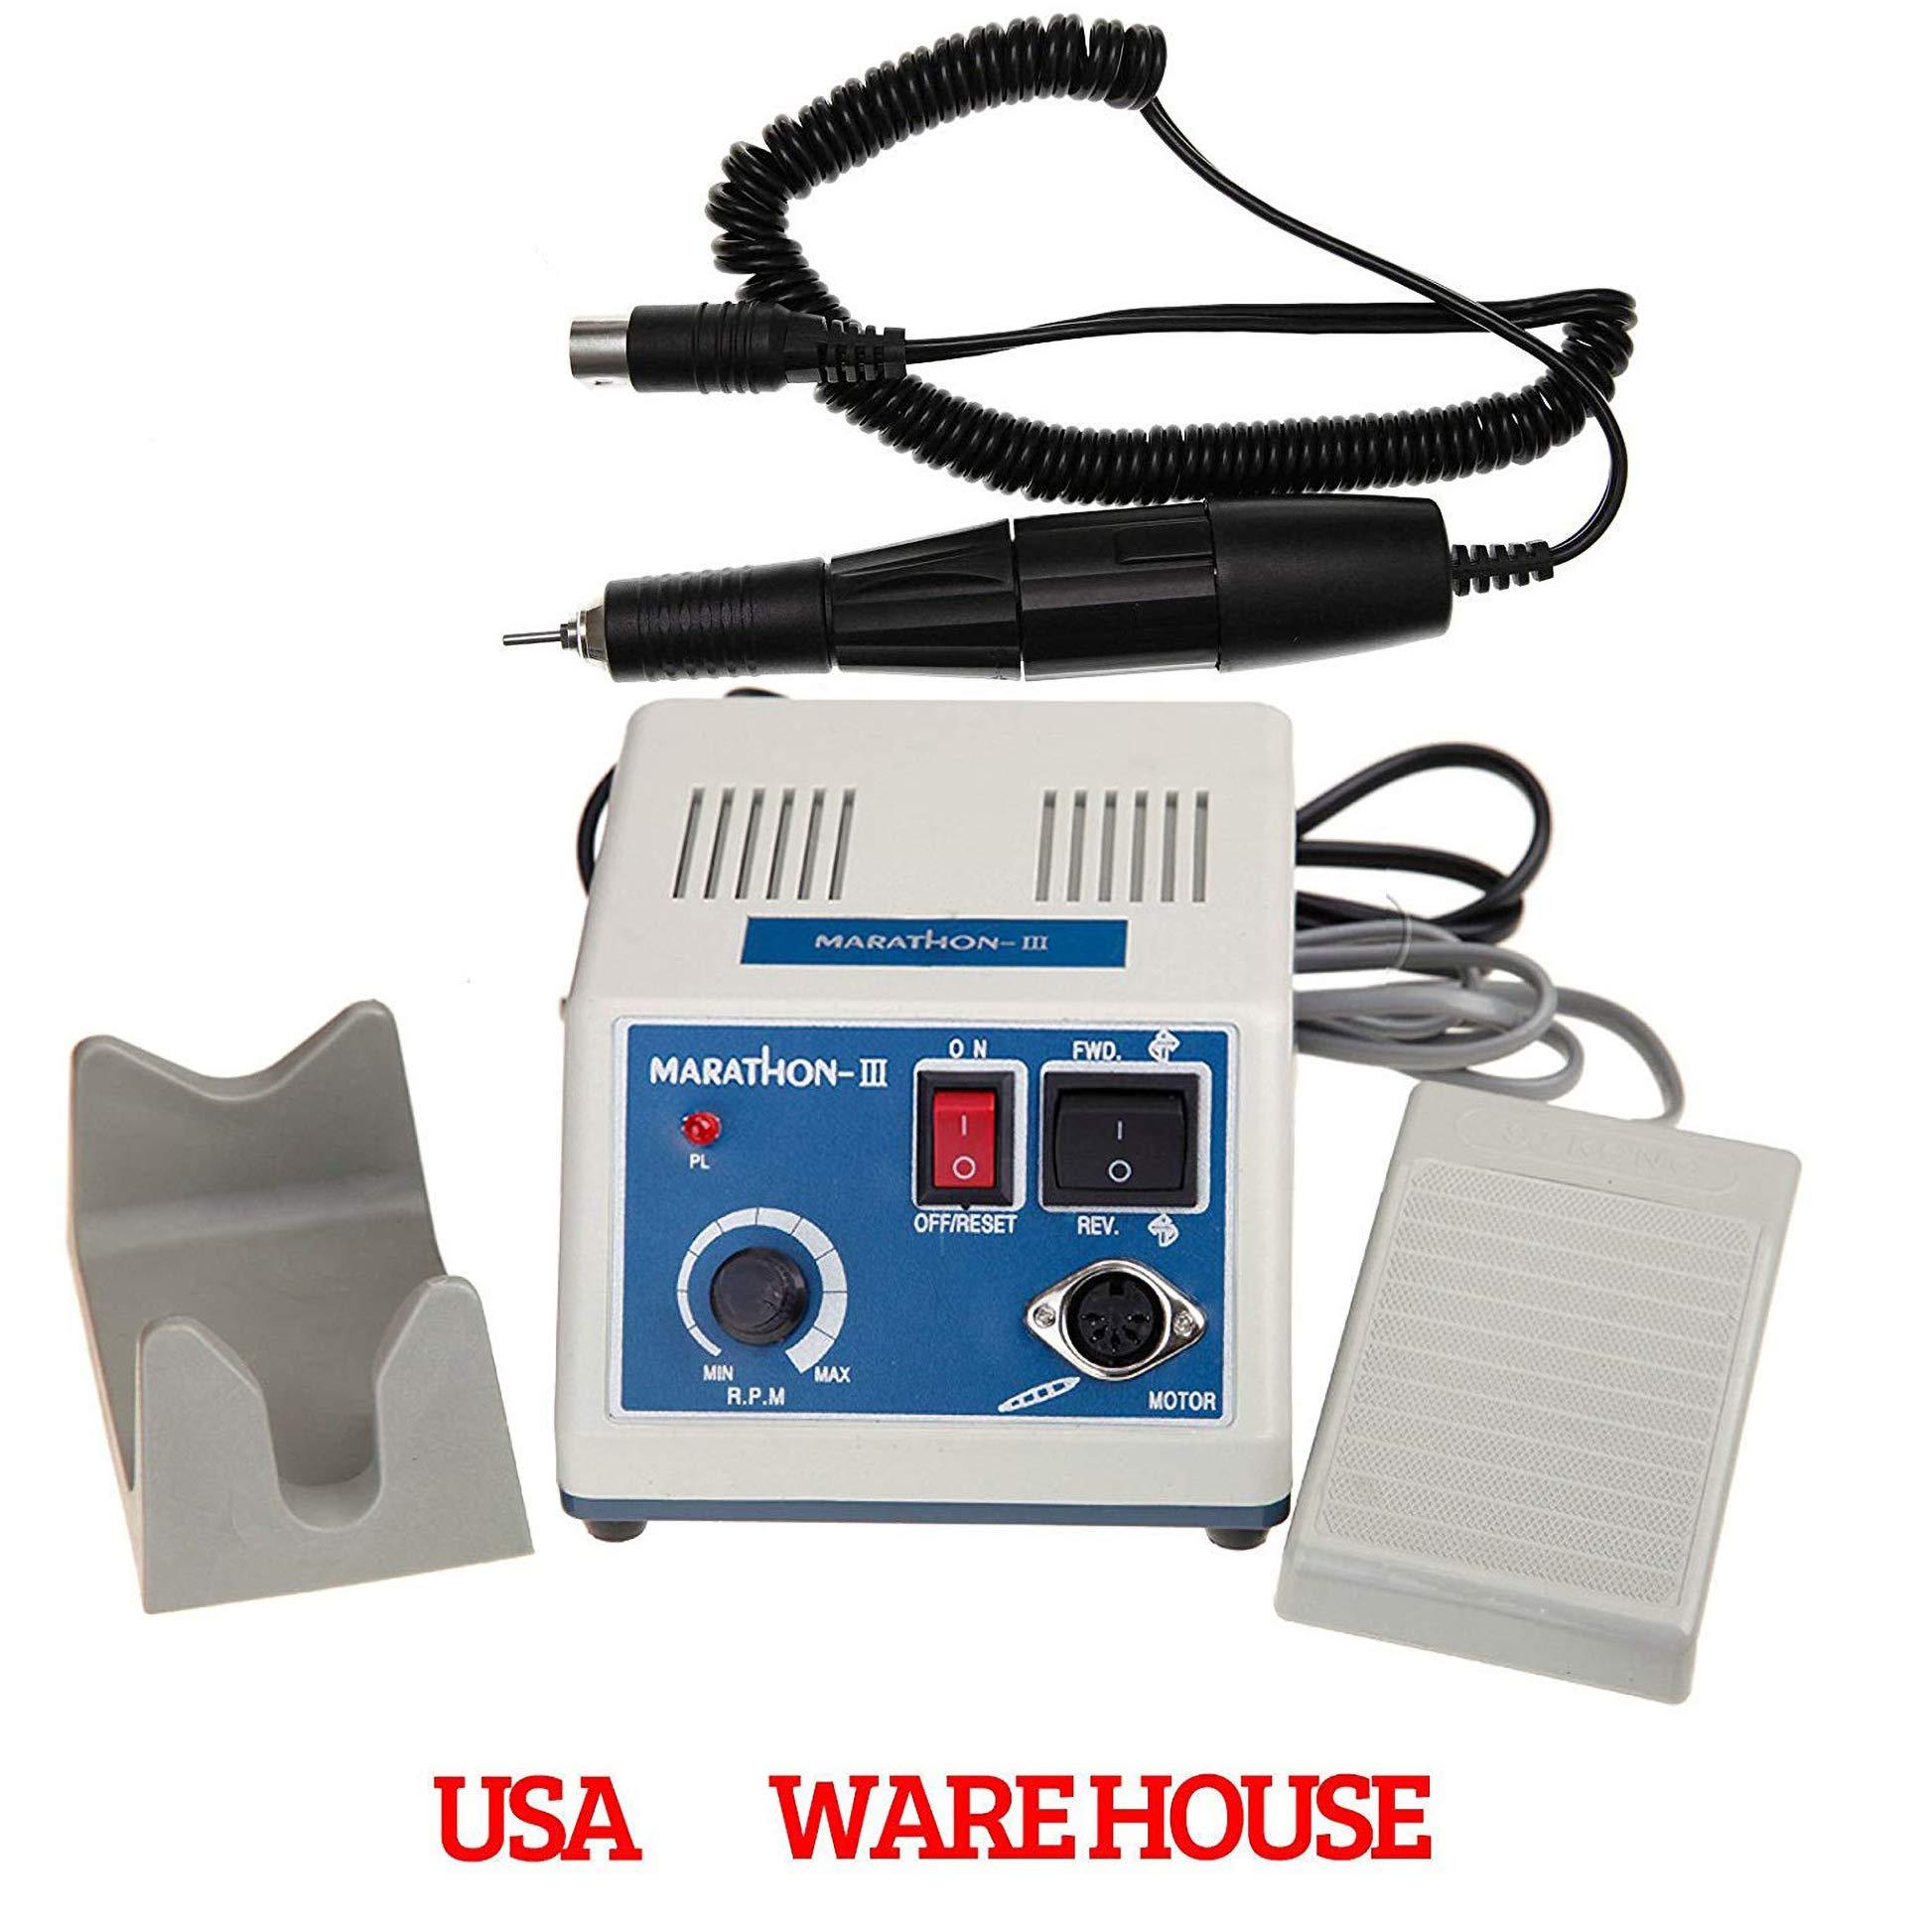 NSKI USA Lab MARATHON -III MICROMOTOR Electric 35000 RPM Polisher Unit N3